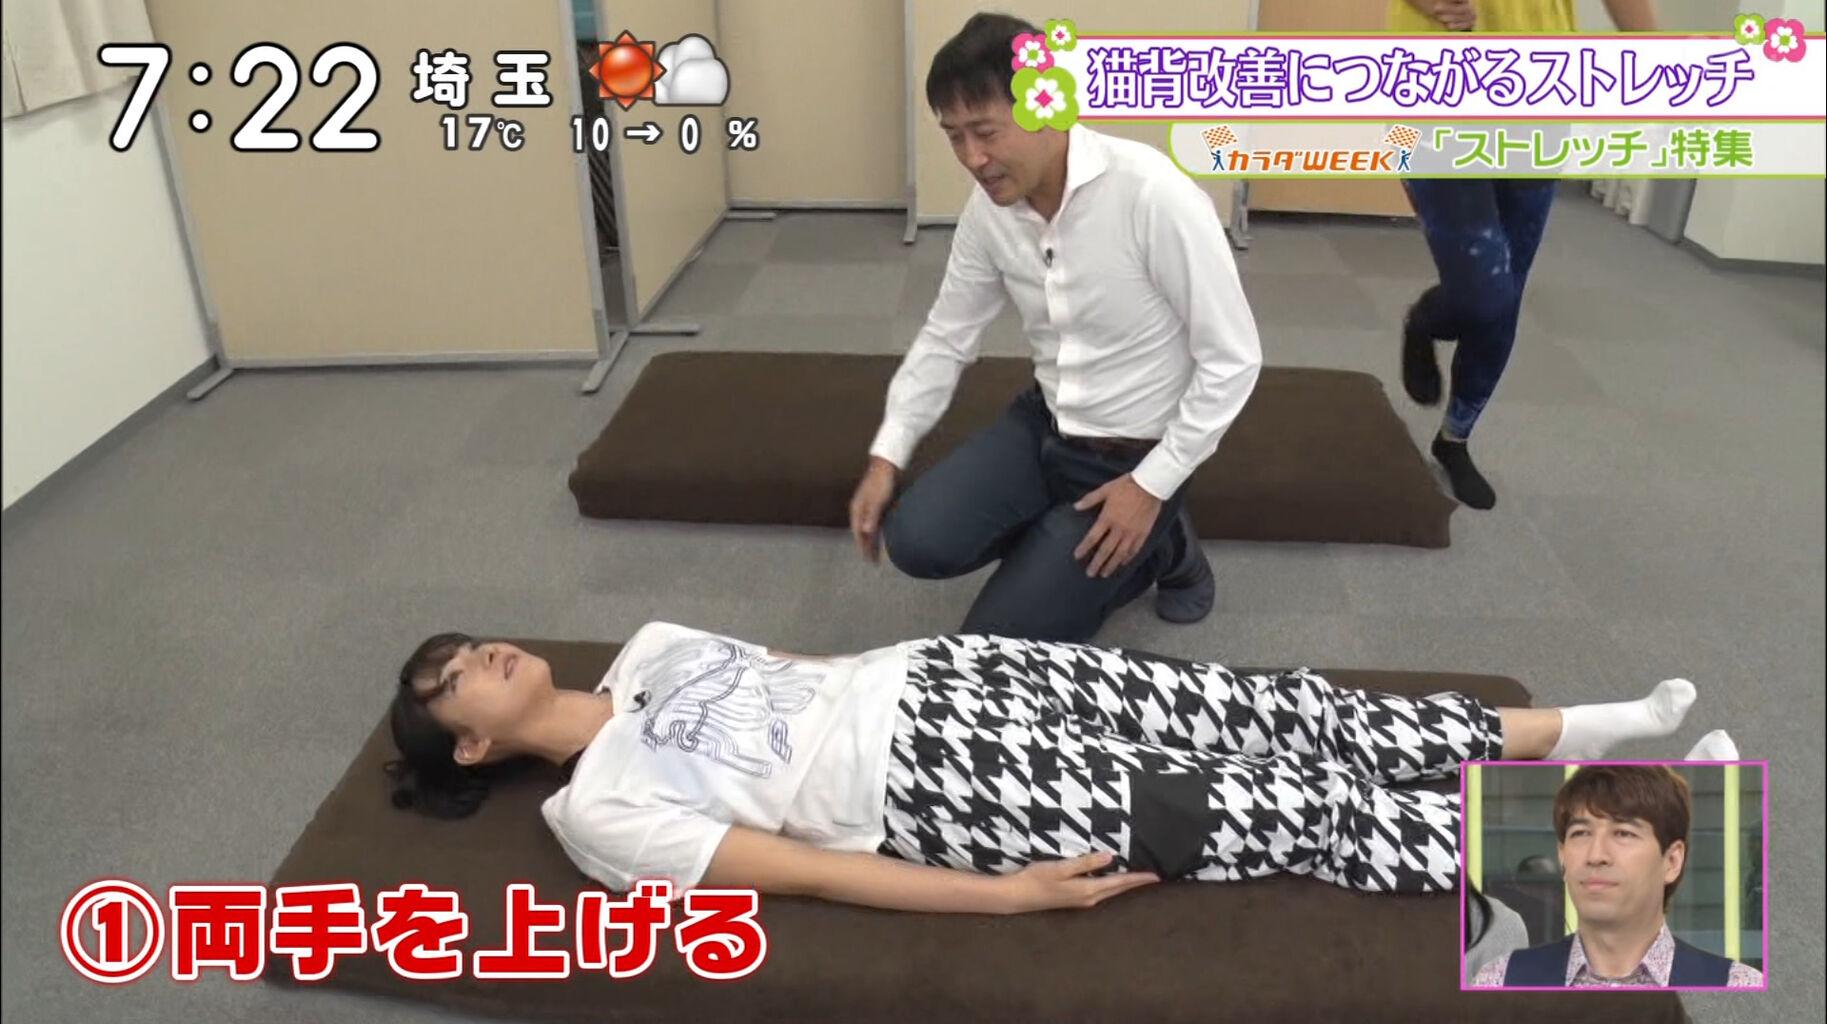 https://livedoor.blogimg.jp/himahiki/imgs/9/2/924ca939.jpg